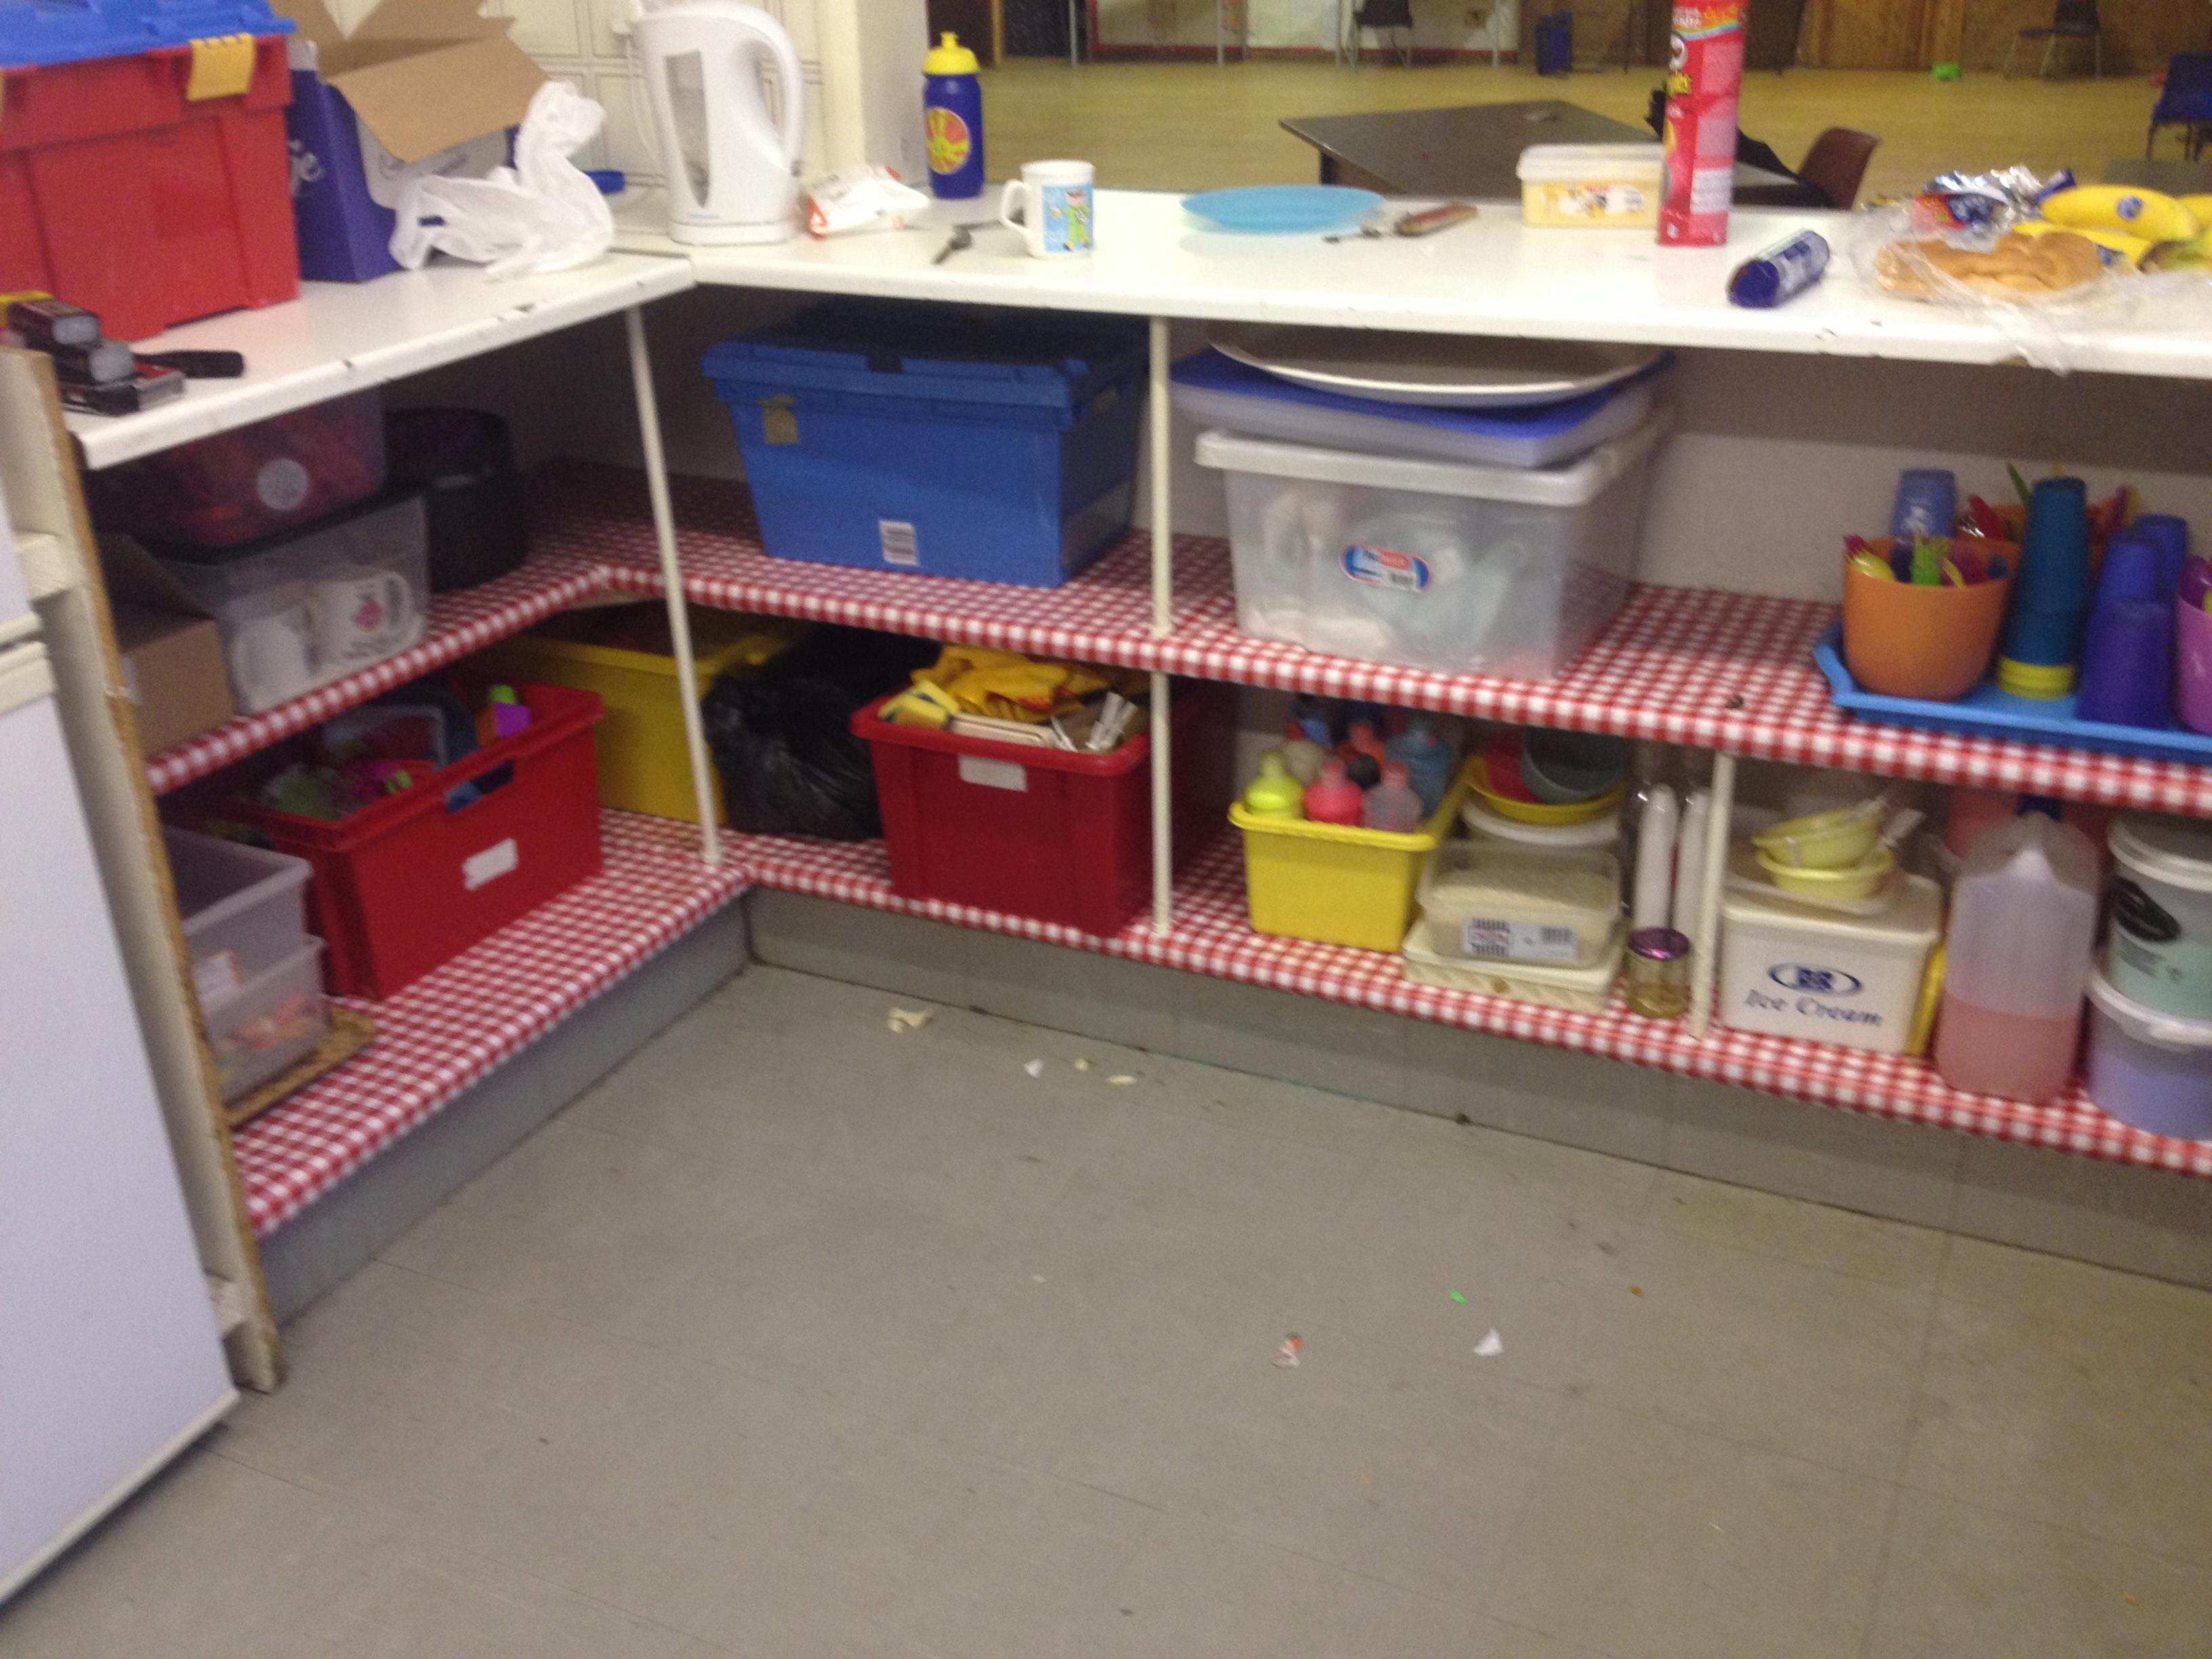 volunteering in edgware scout hut diy 2nd edgware scouts. Black Bedroom Furniture Sets. Home Design Ideas